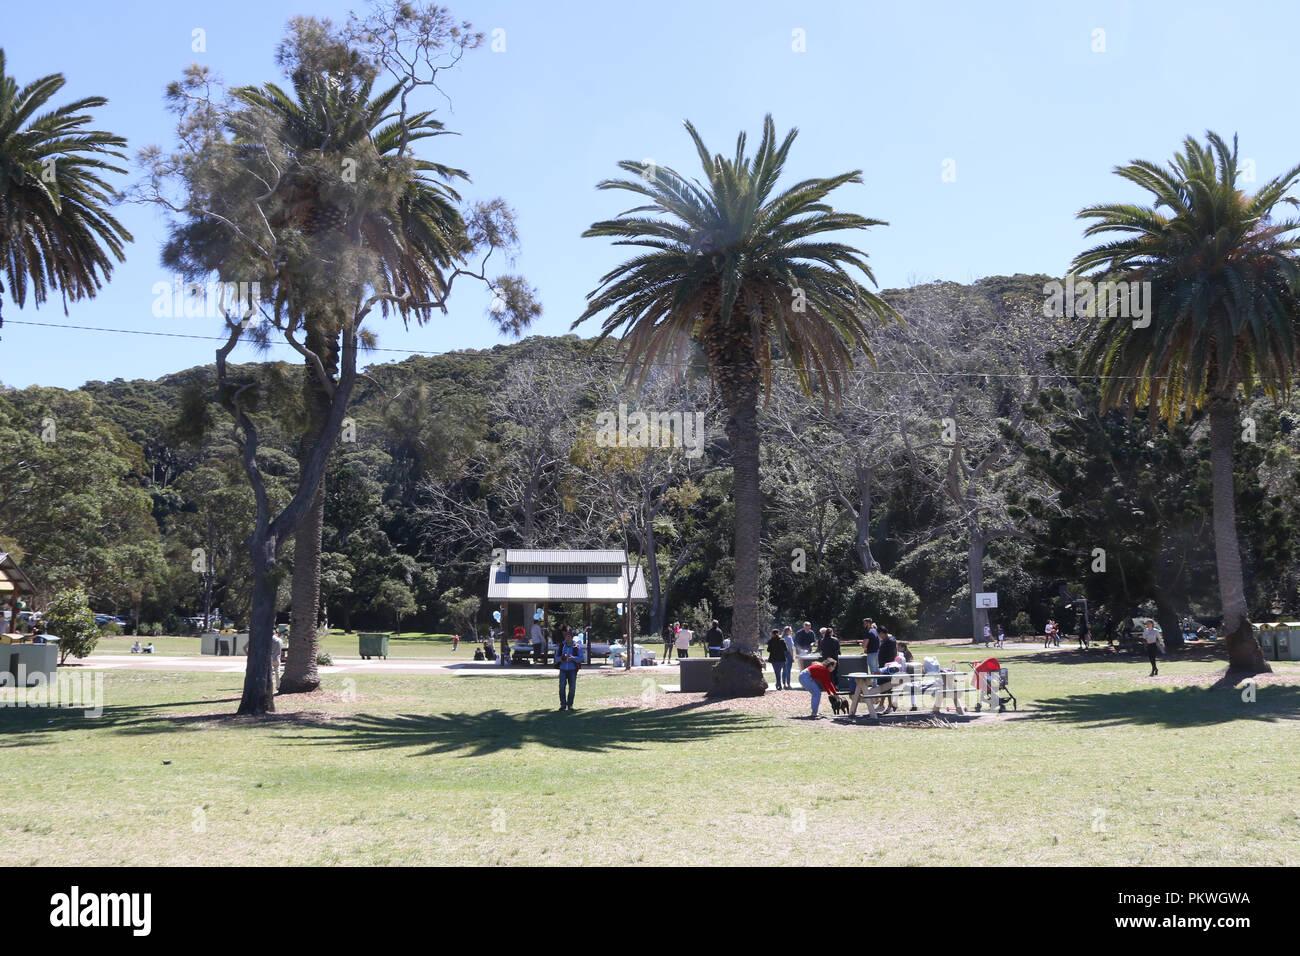 Clifton Gardens Reserve, Mosman on Sydney's lower north shore. - Stock Image